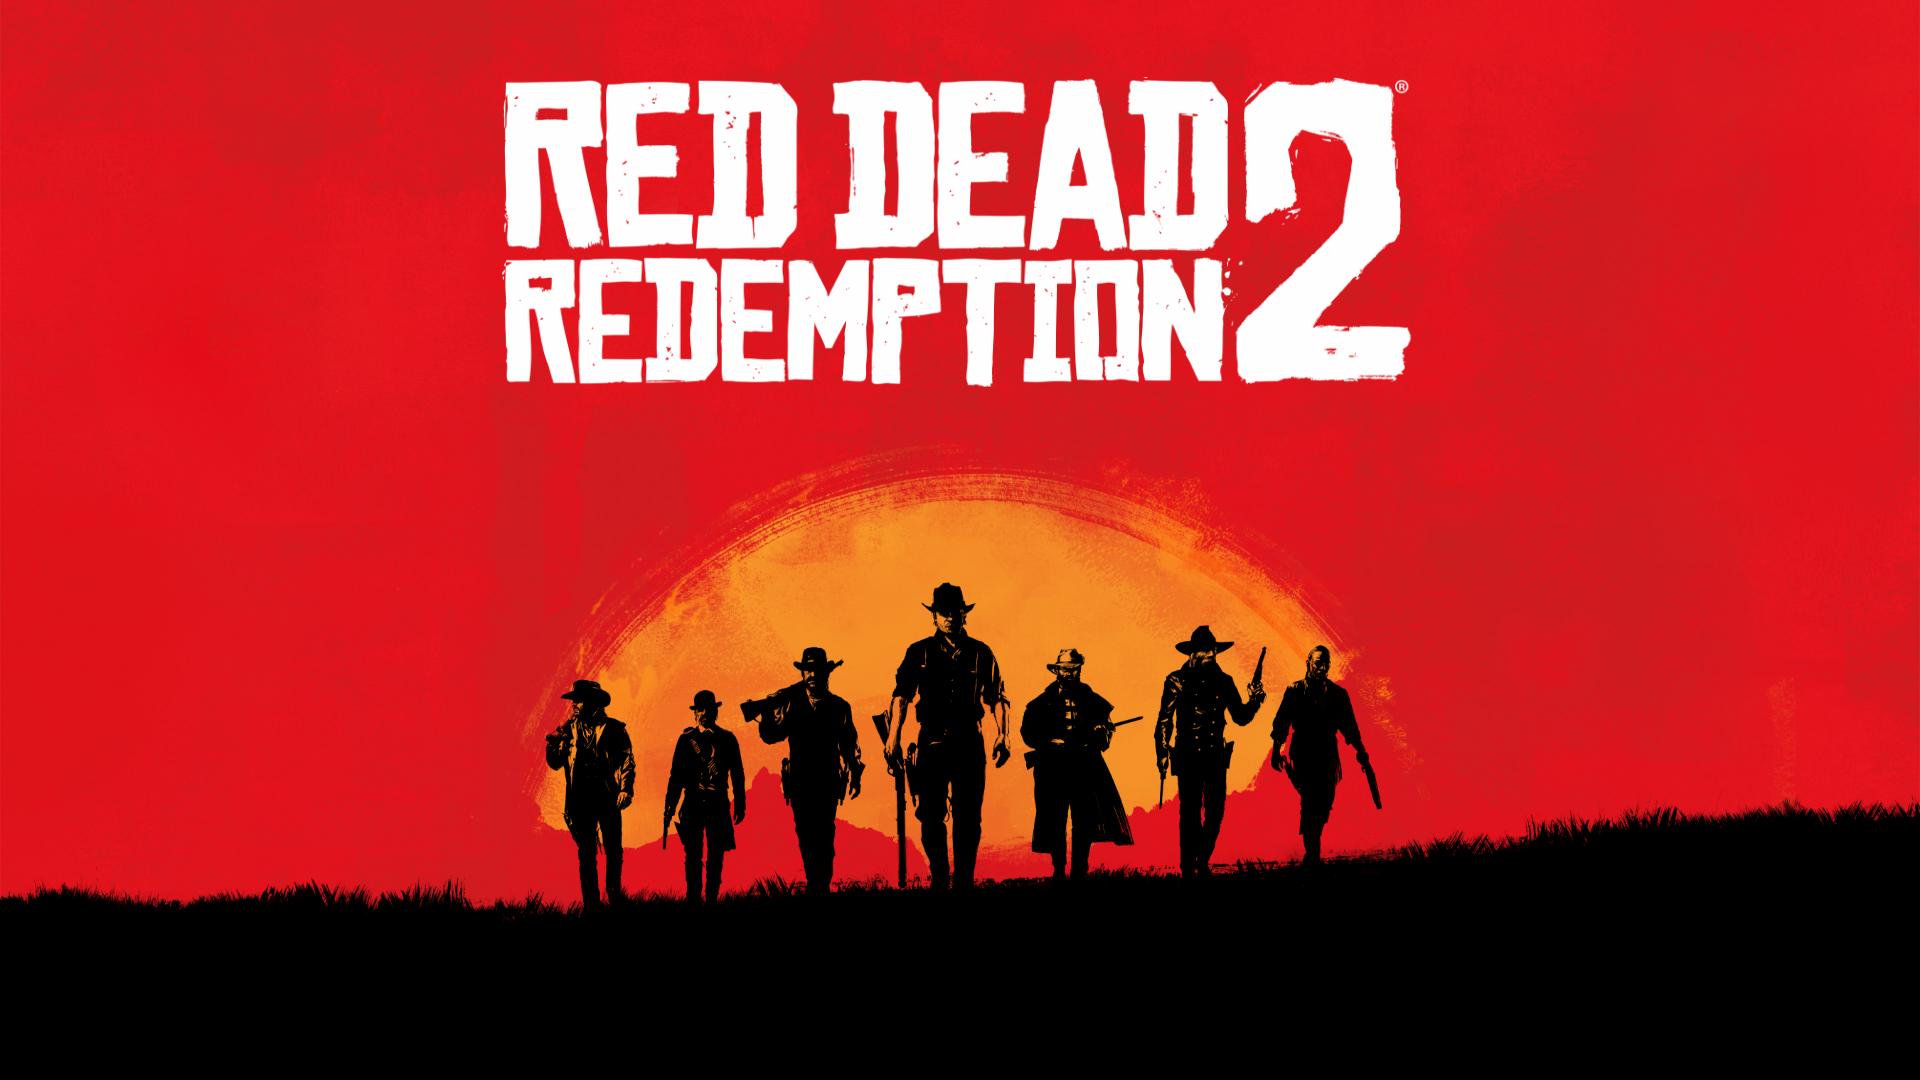 Red Dead Redemption 2 Background